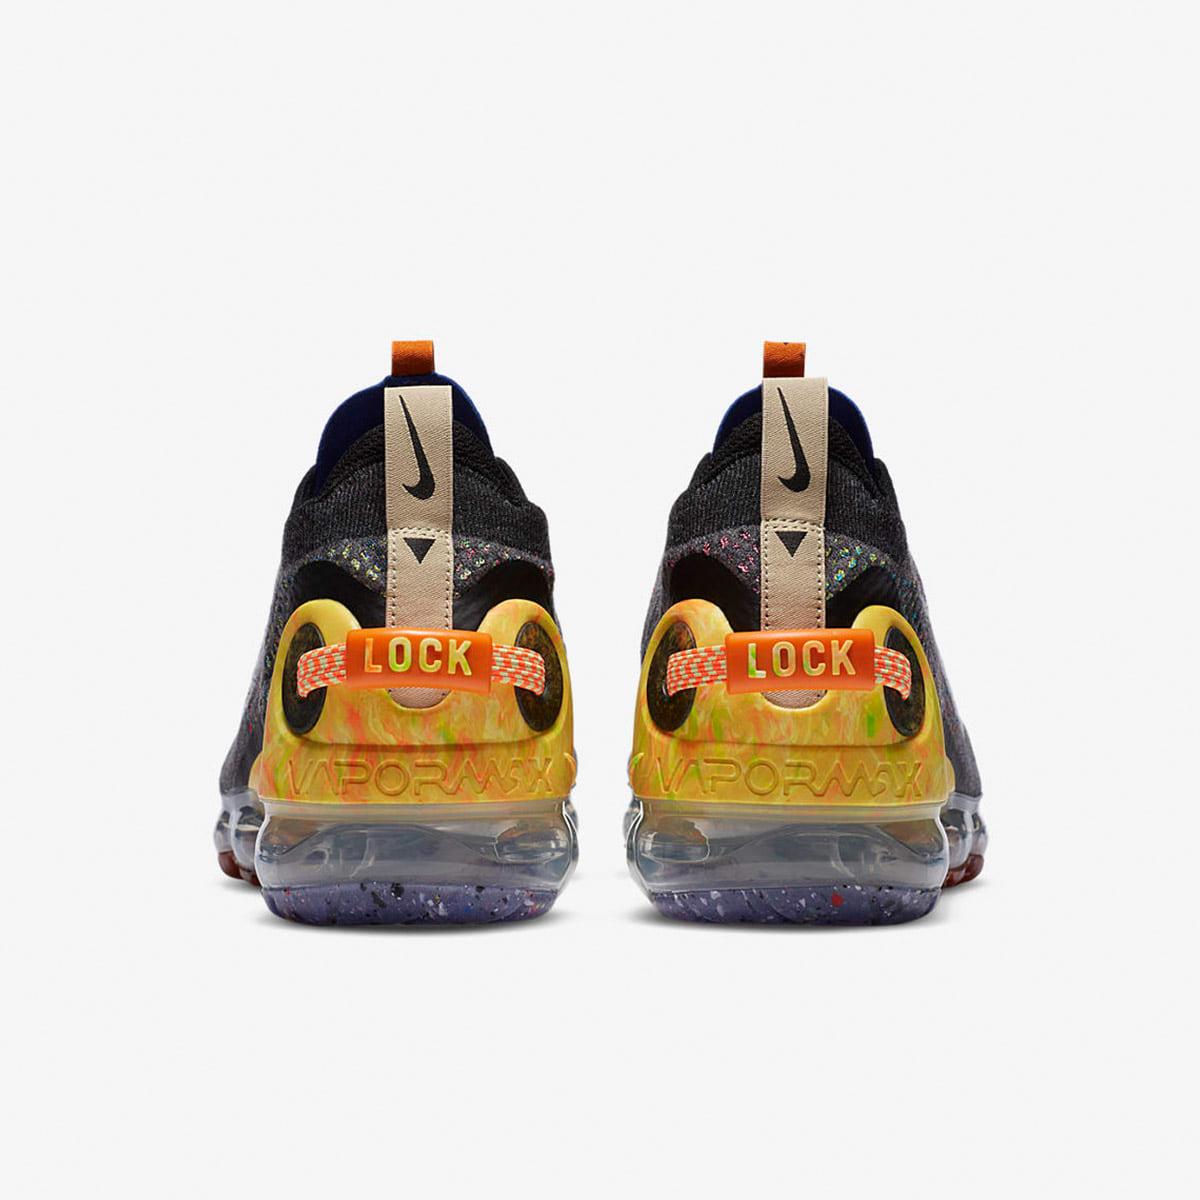 Nike Air Vapormax 2020 - CJ6740-003